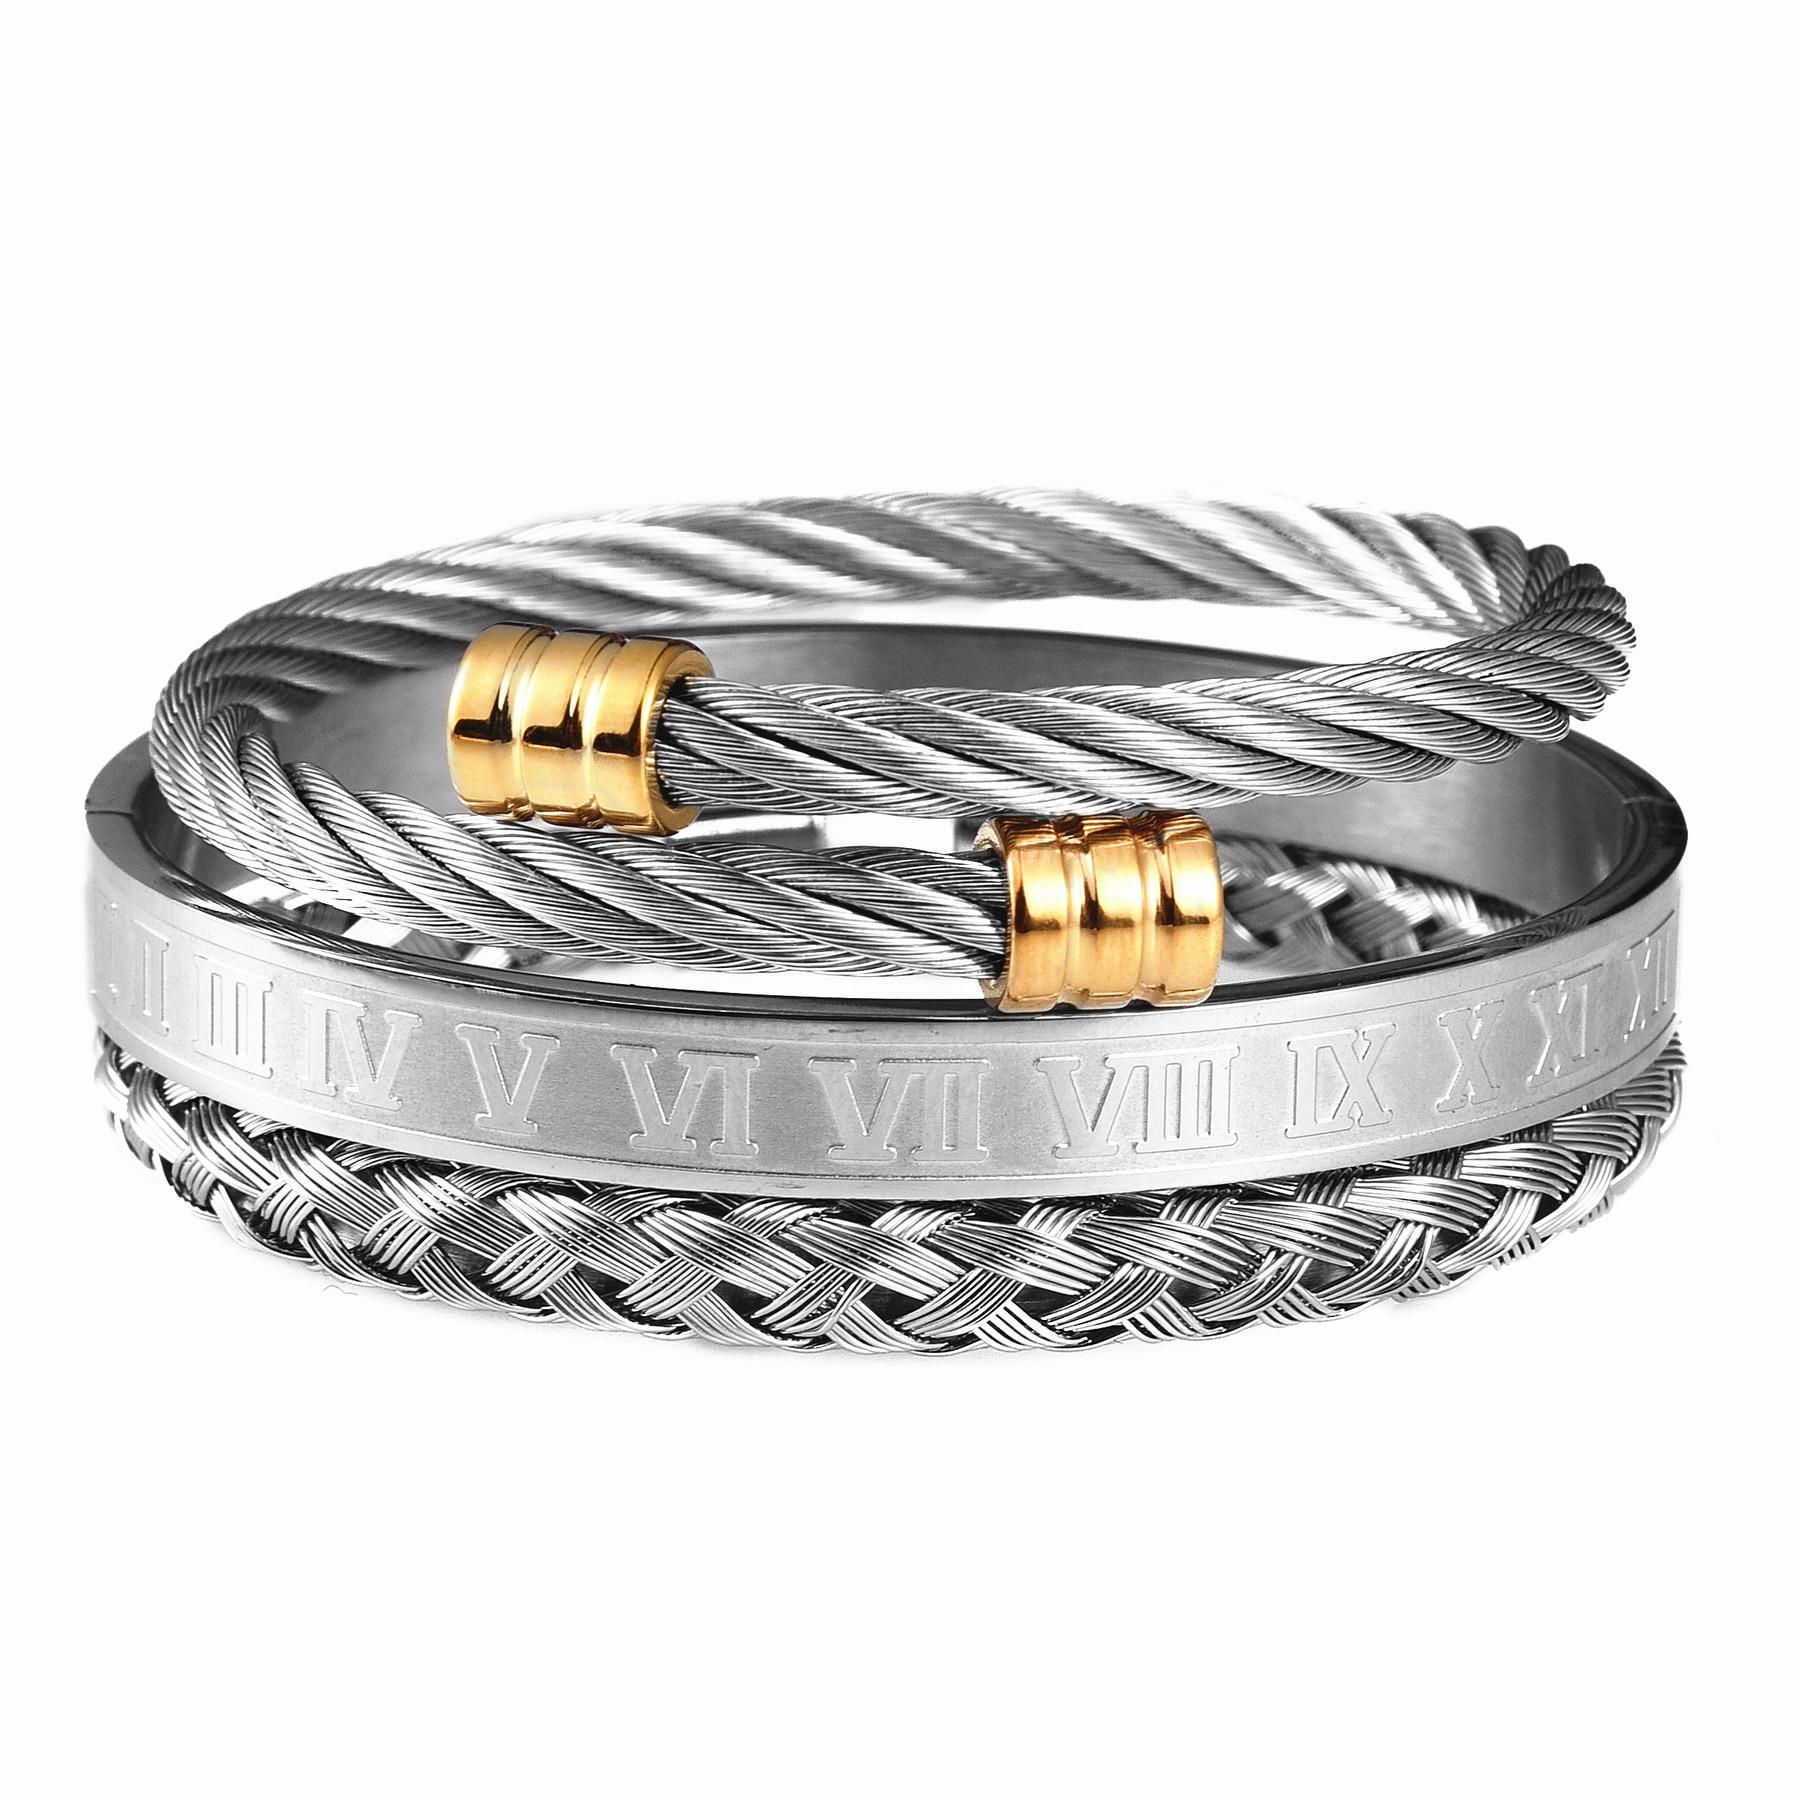 Luxury 3-piece bracelet set